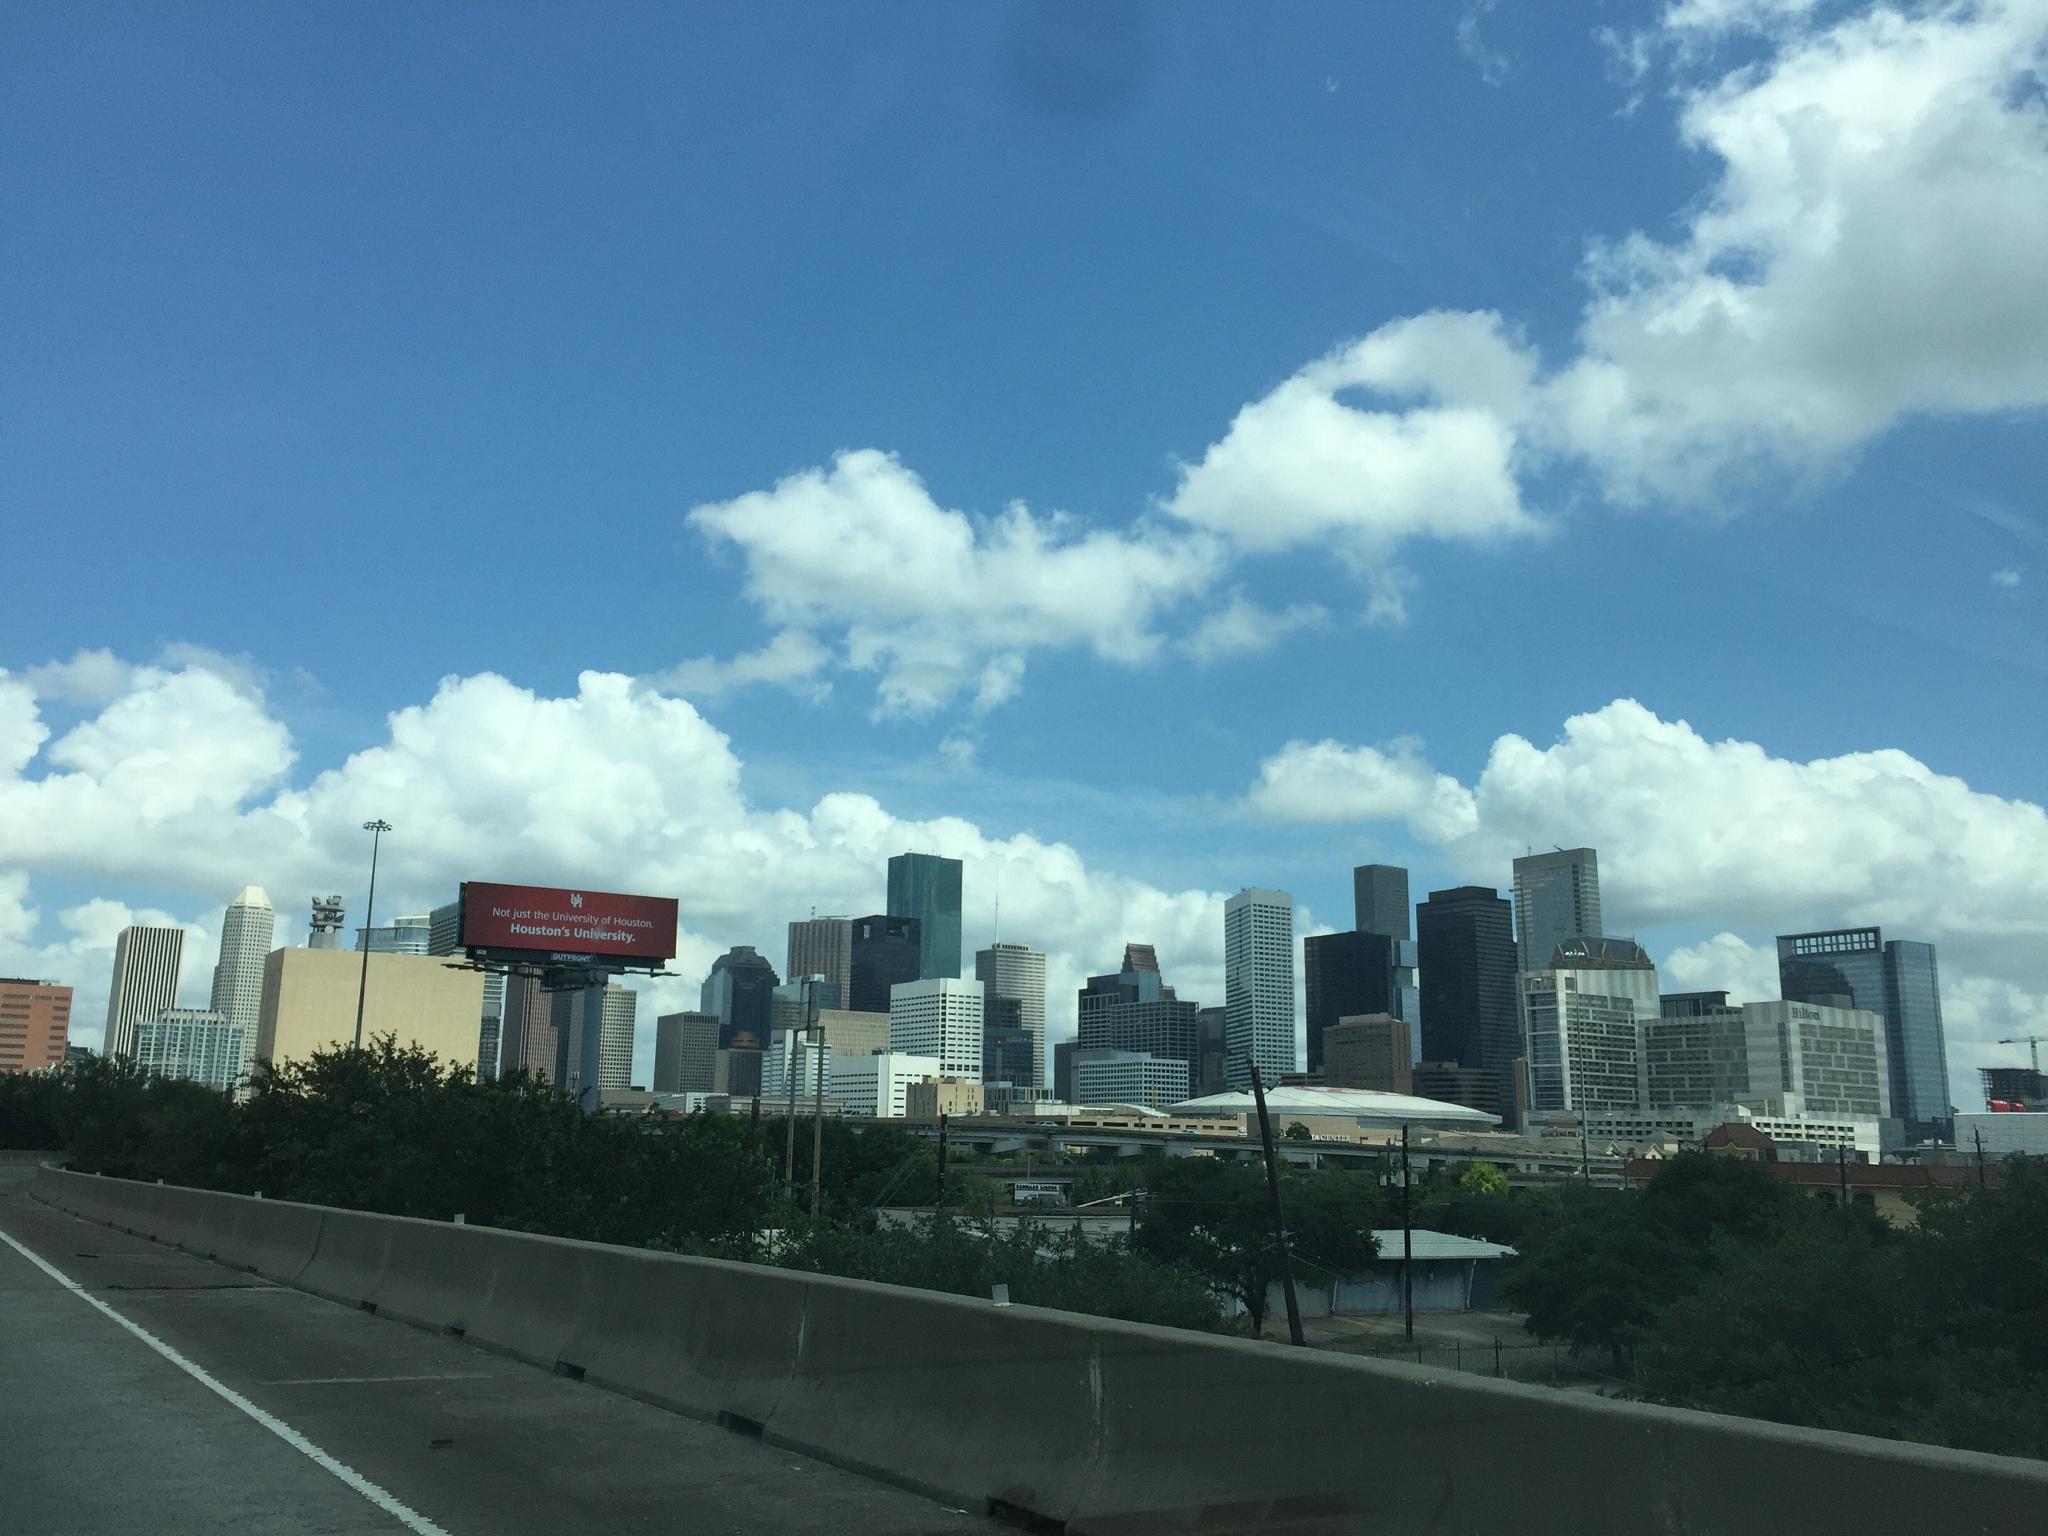 Houston, TX by marian.states